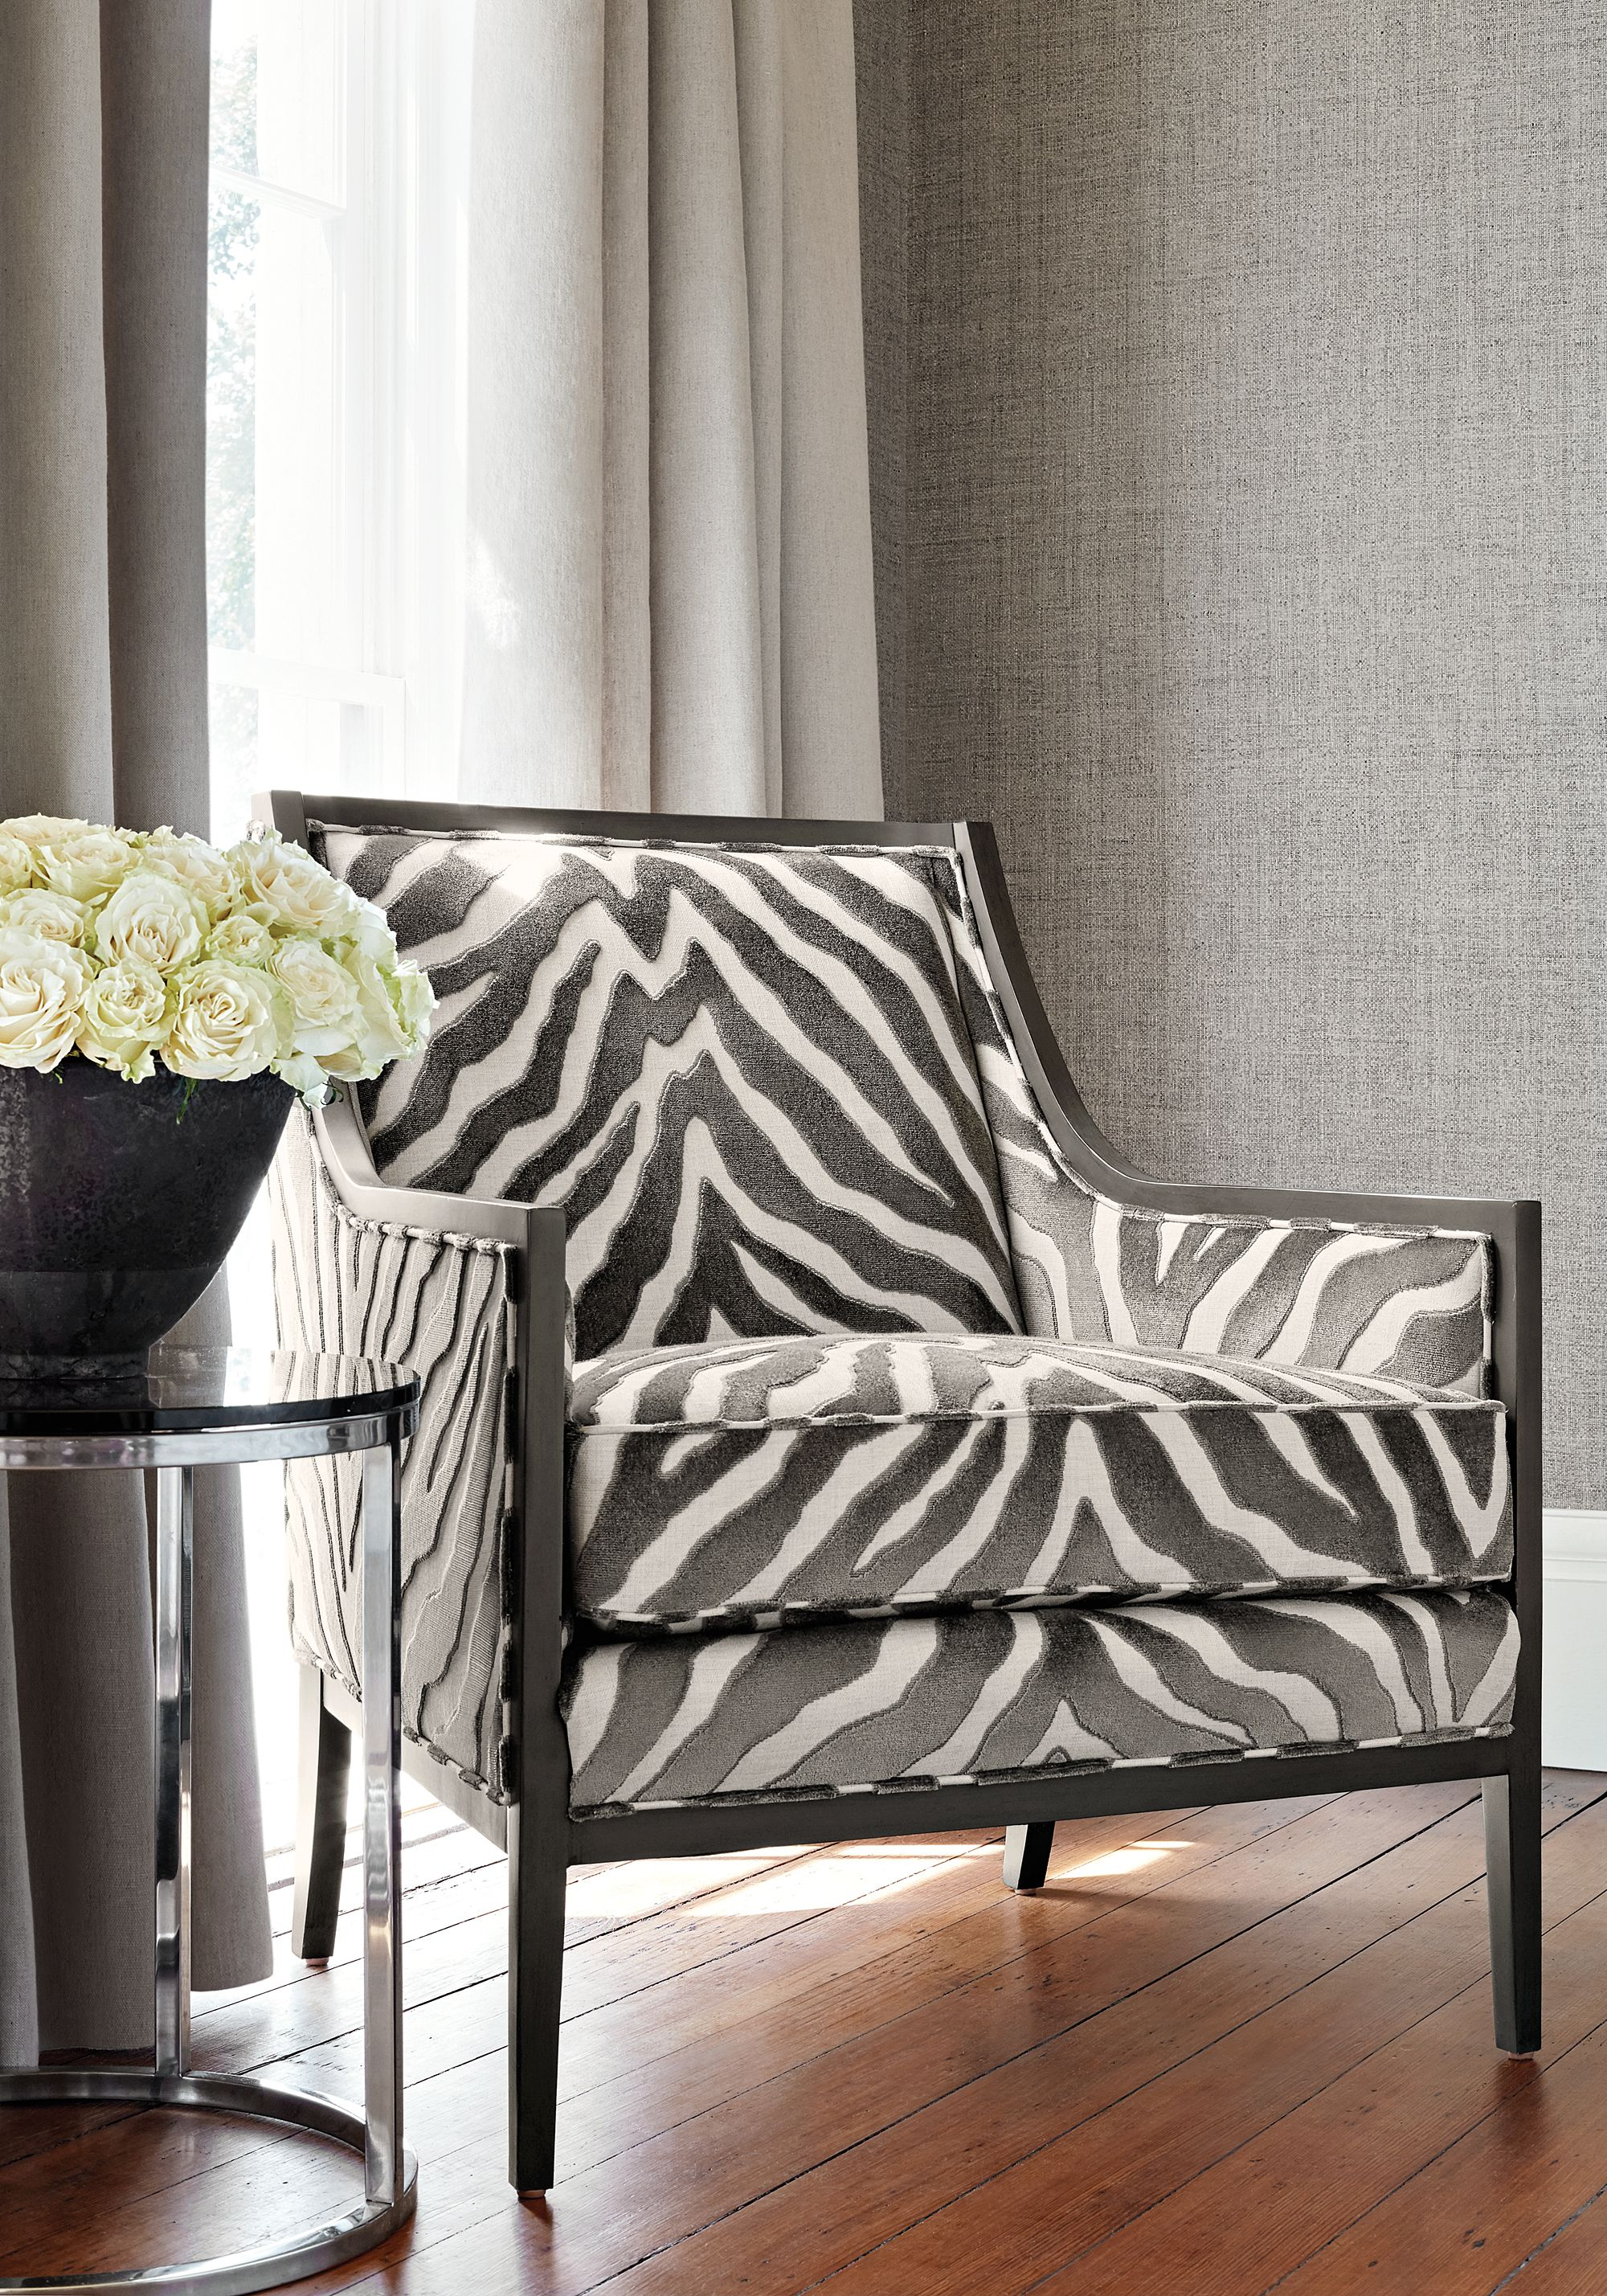 Pasadena Chair From Thibaut Fine Furniture In Etosha